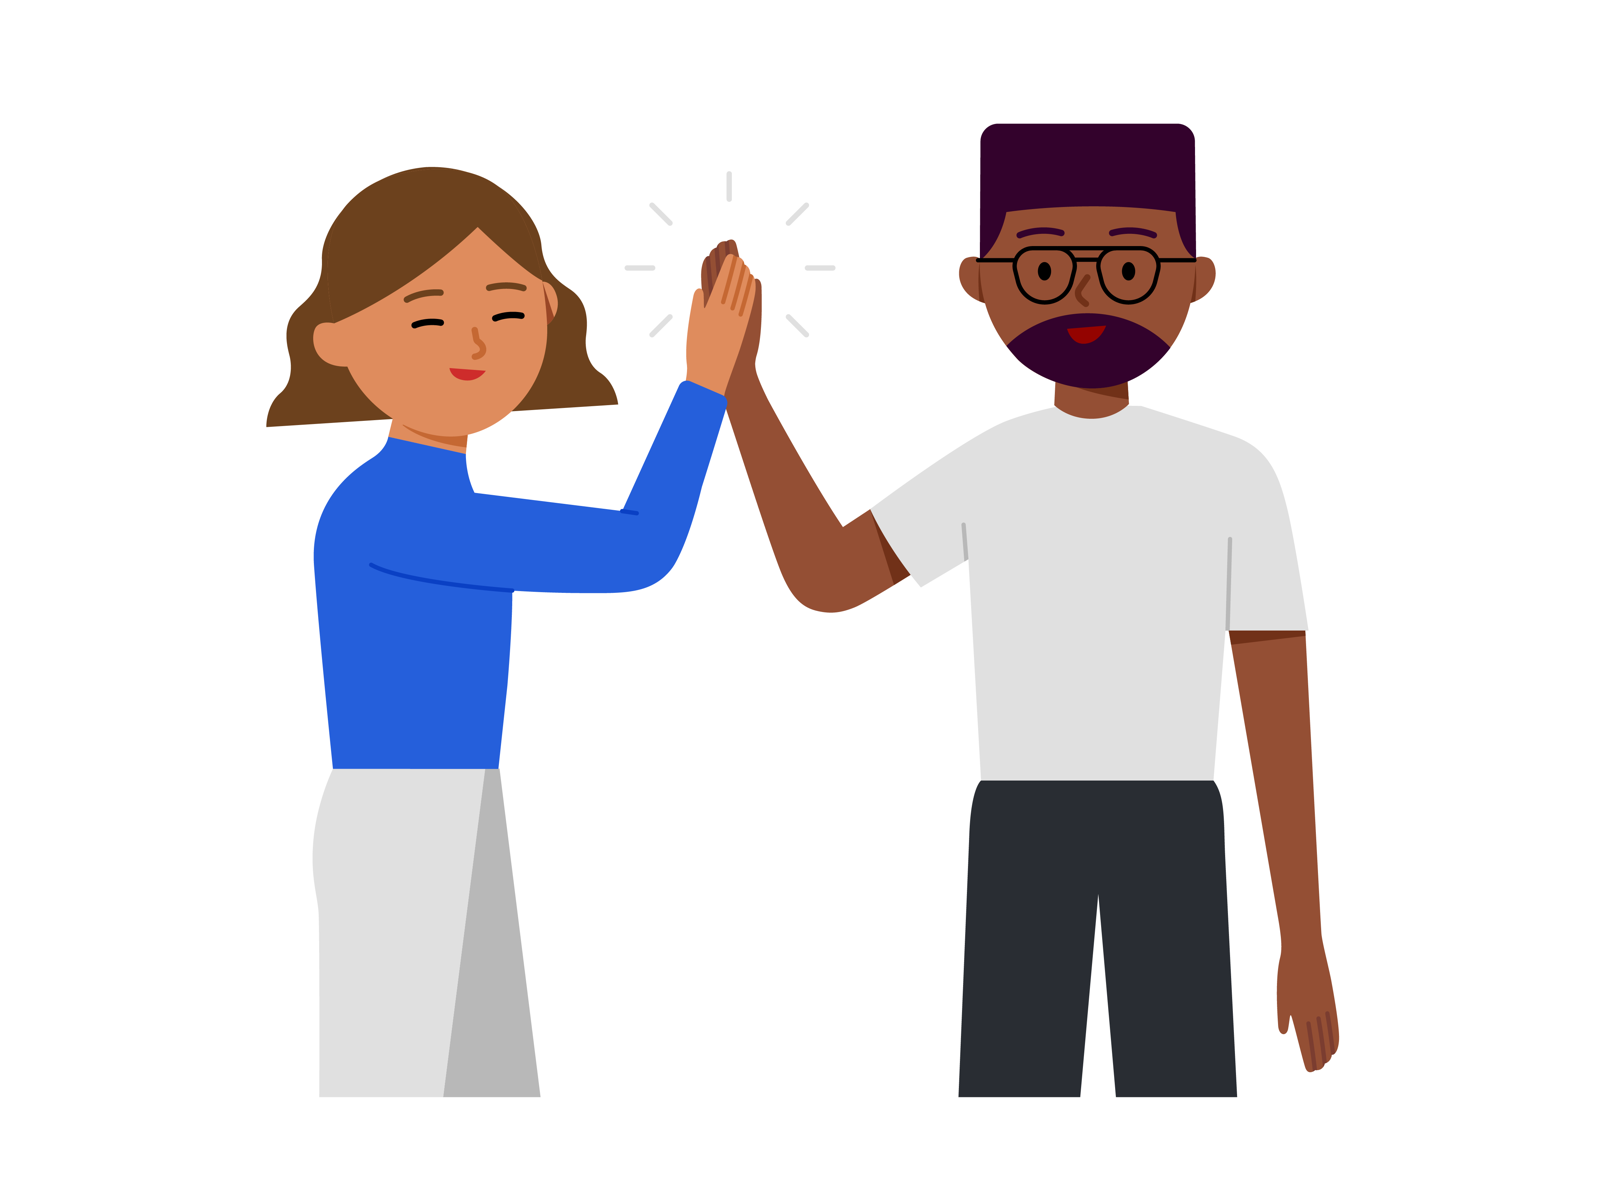 Partners hero illustration